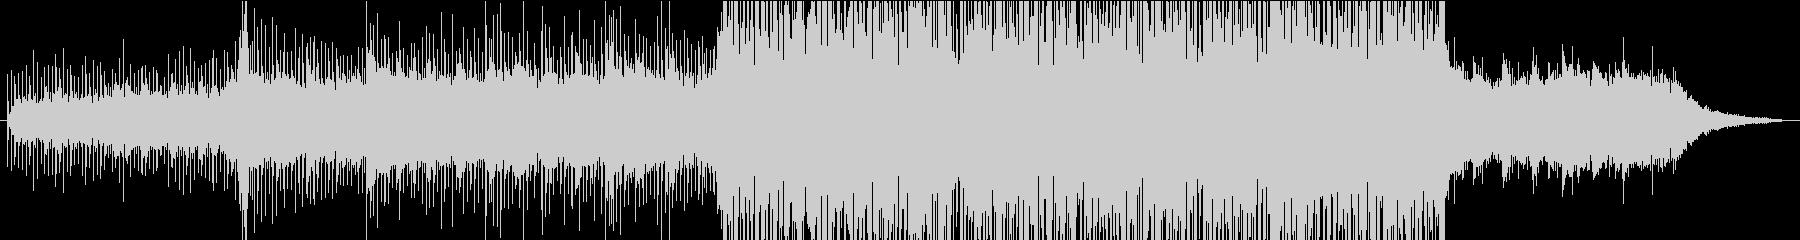 Foley/感動的なエレクトロニカ の未再生の波形